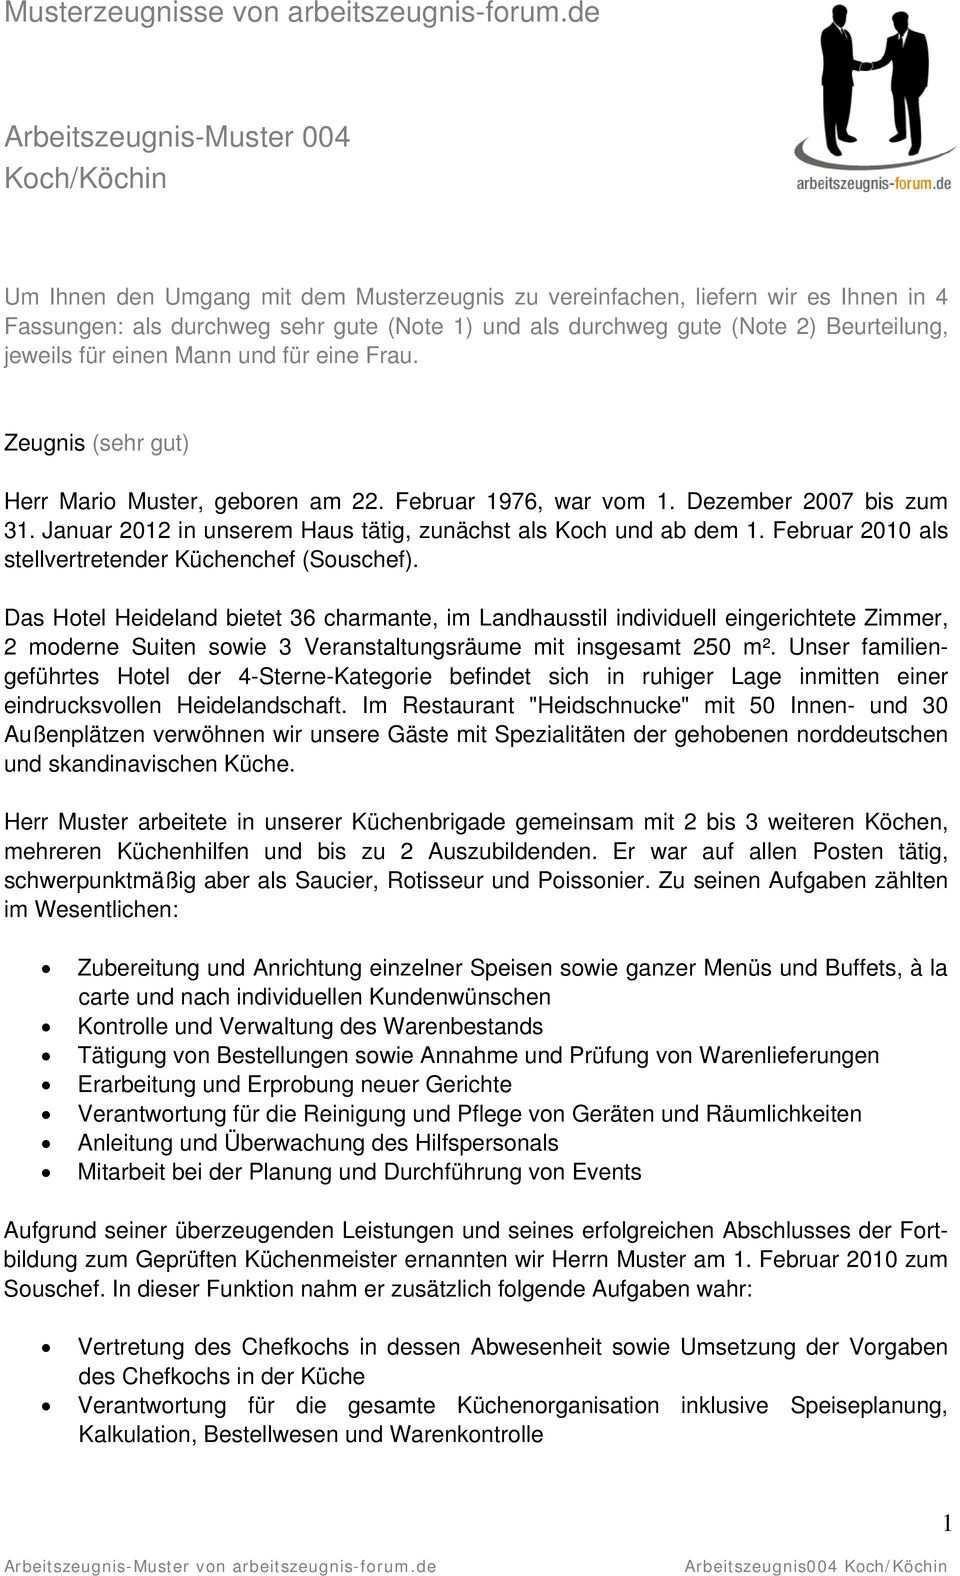 Arbeitszeugnis Muster Von Arbeitszeugnis Forum De Arbeitszeugnis004 Koch Kochin Pdf Free Download